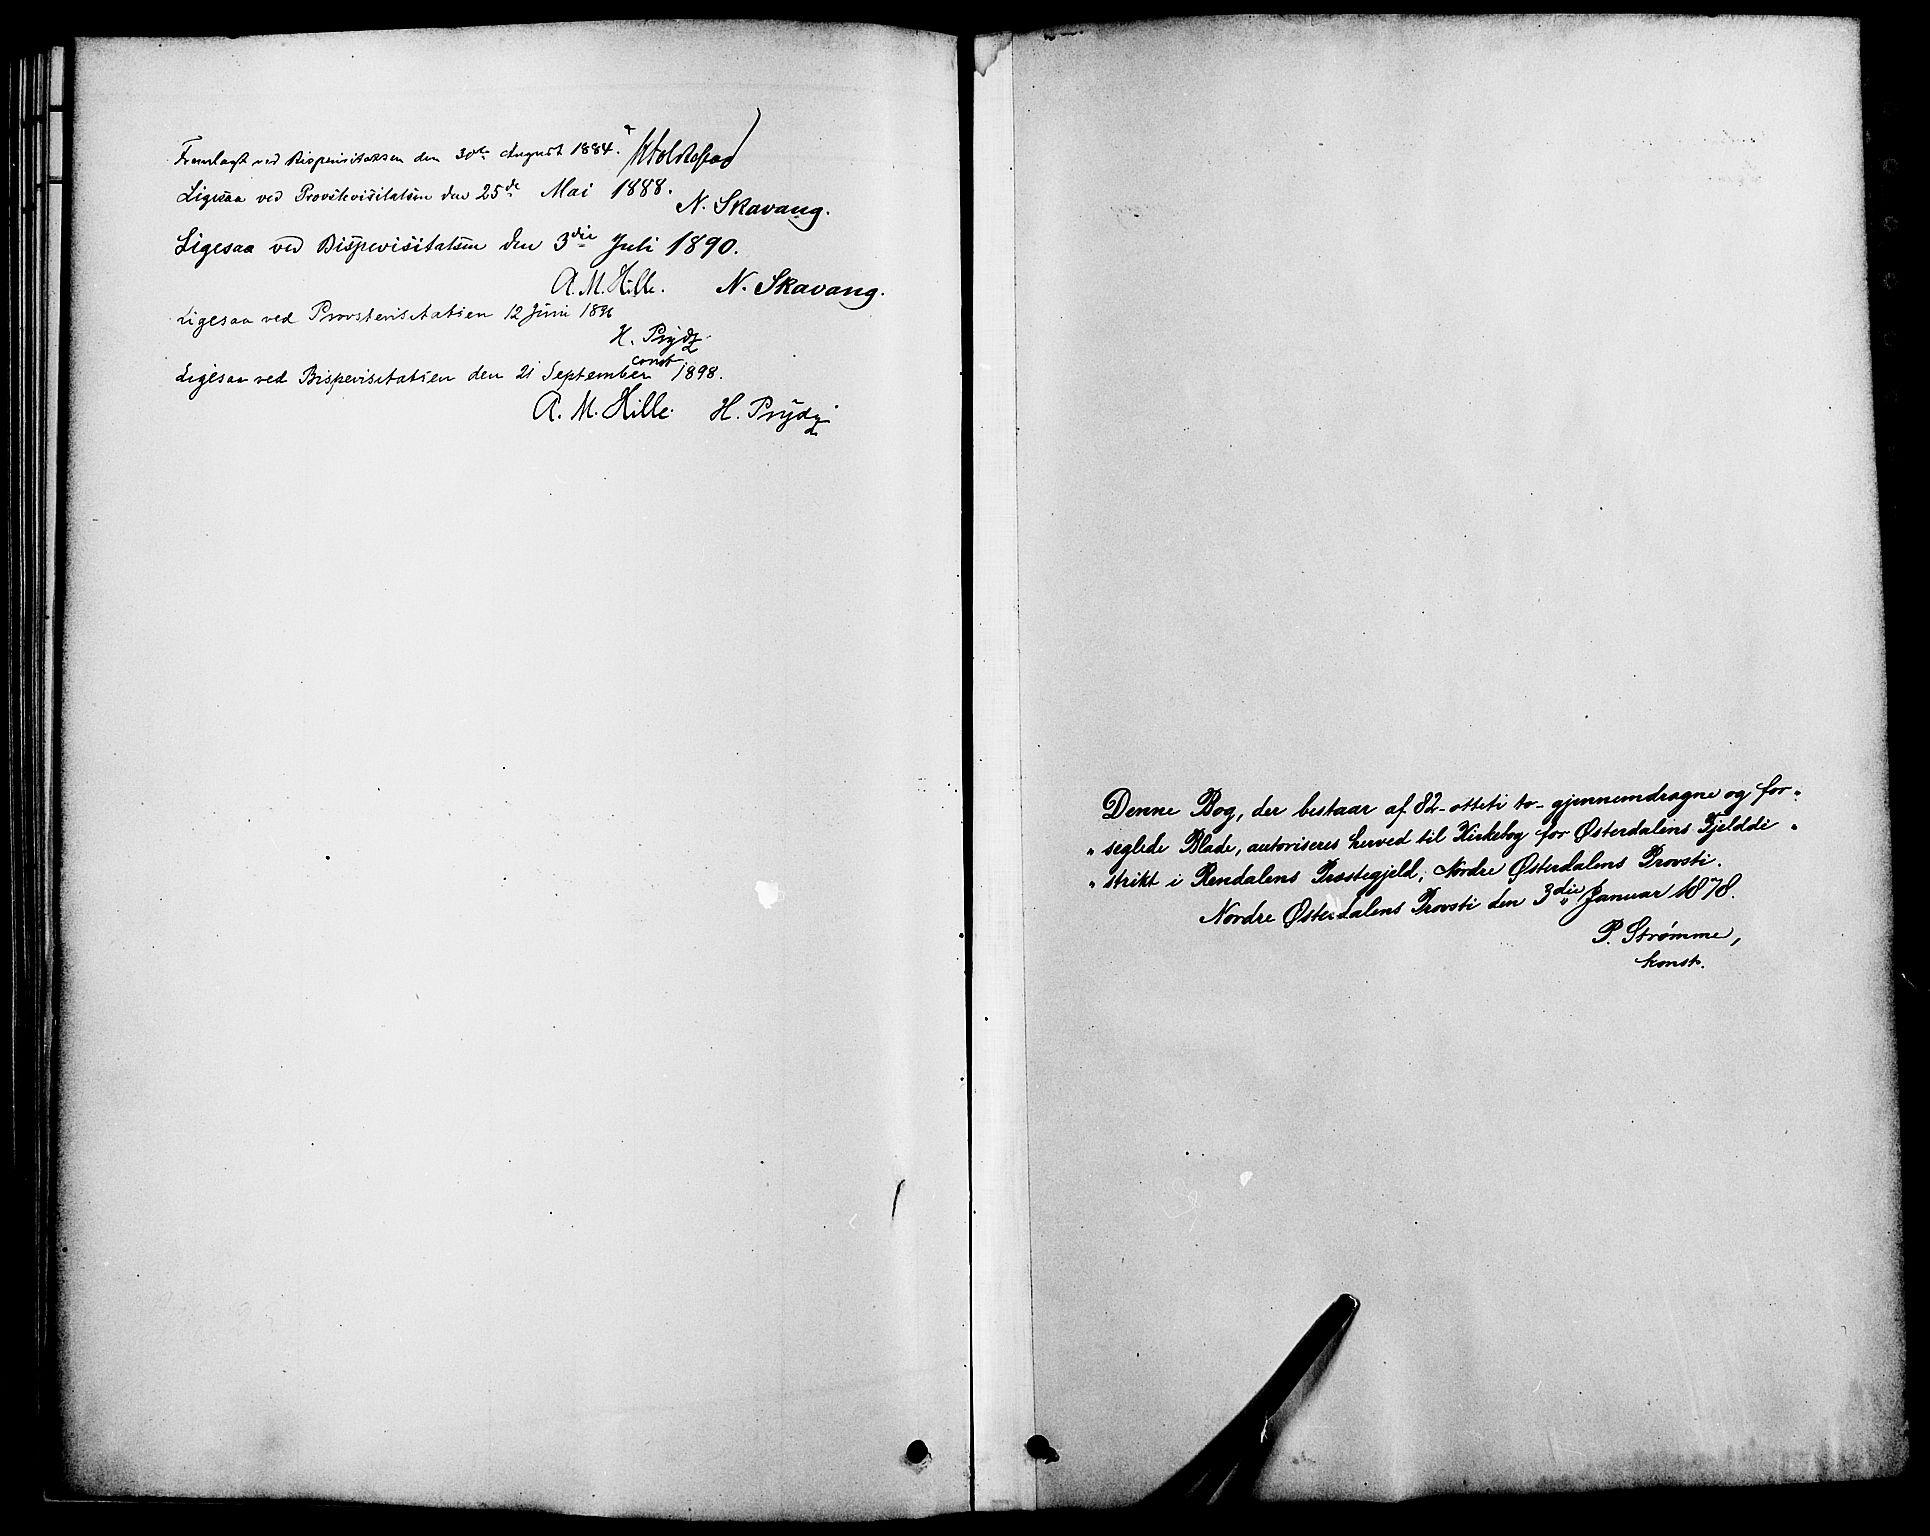 SAH, Rendalen prestekontor, H/Ha/Haa/L0007: Parish register (official) no. 7, 1878-1898